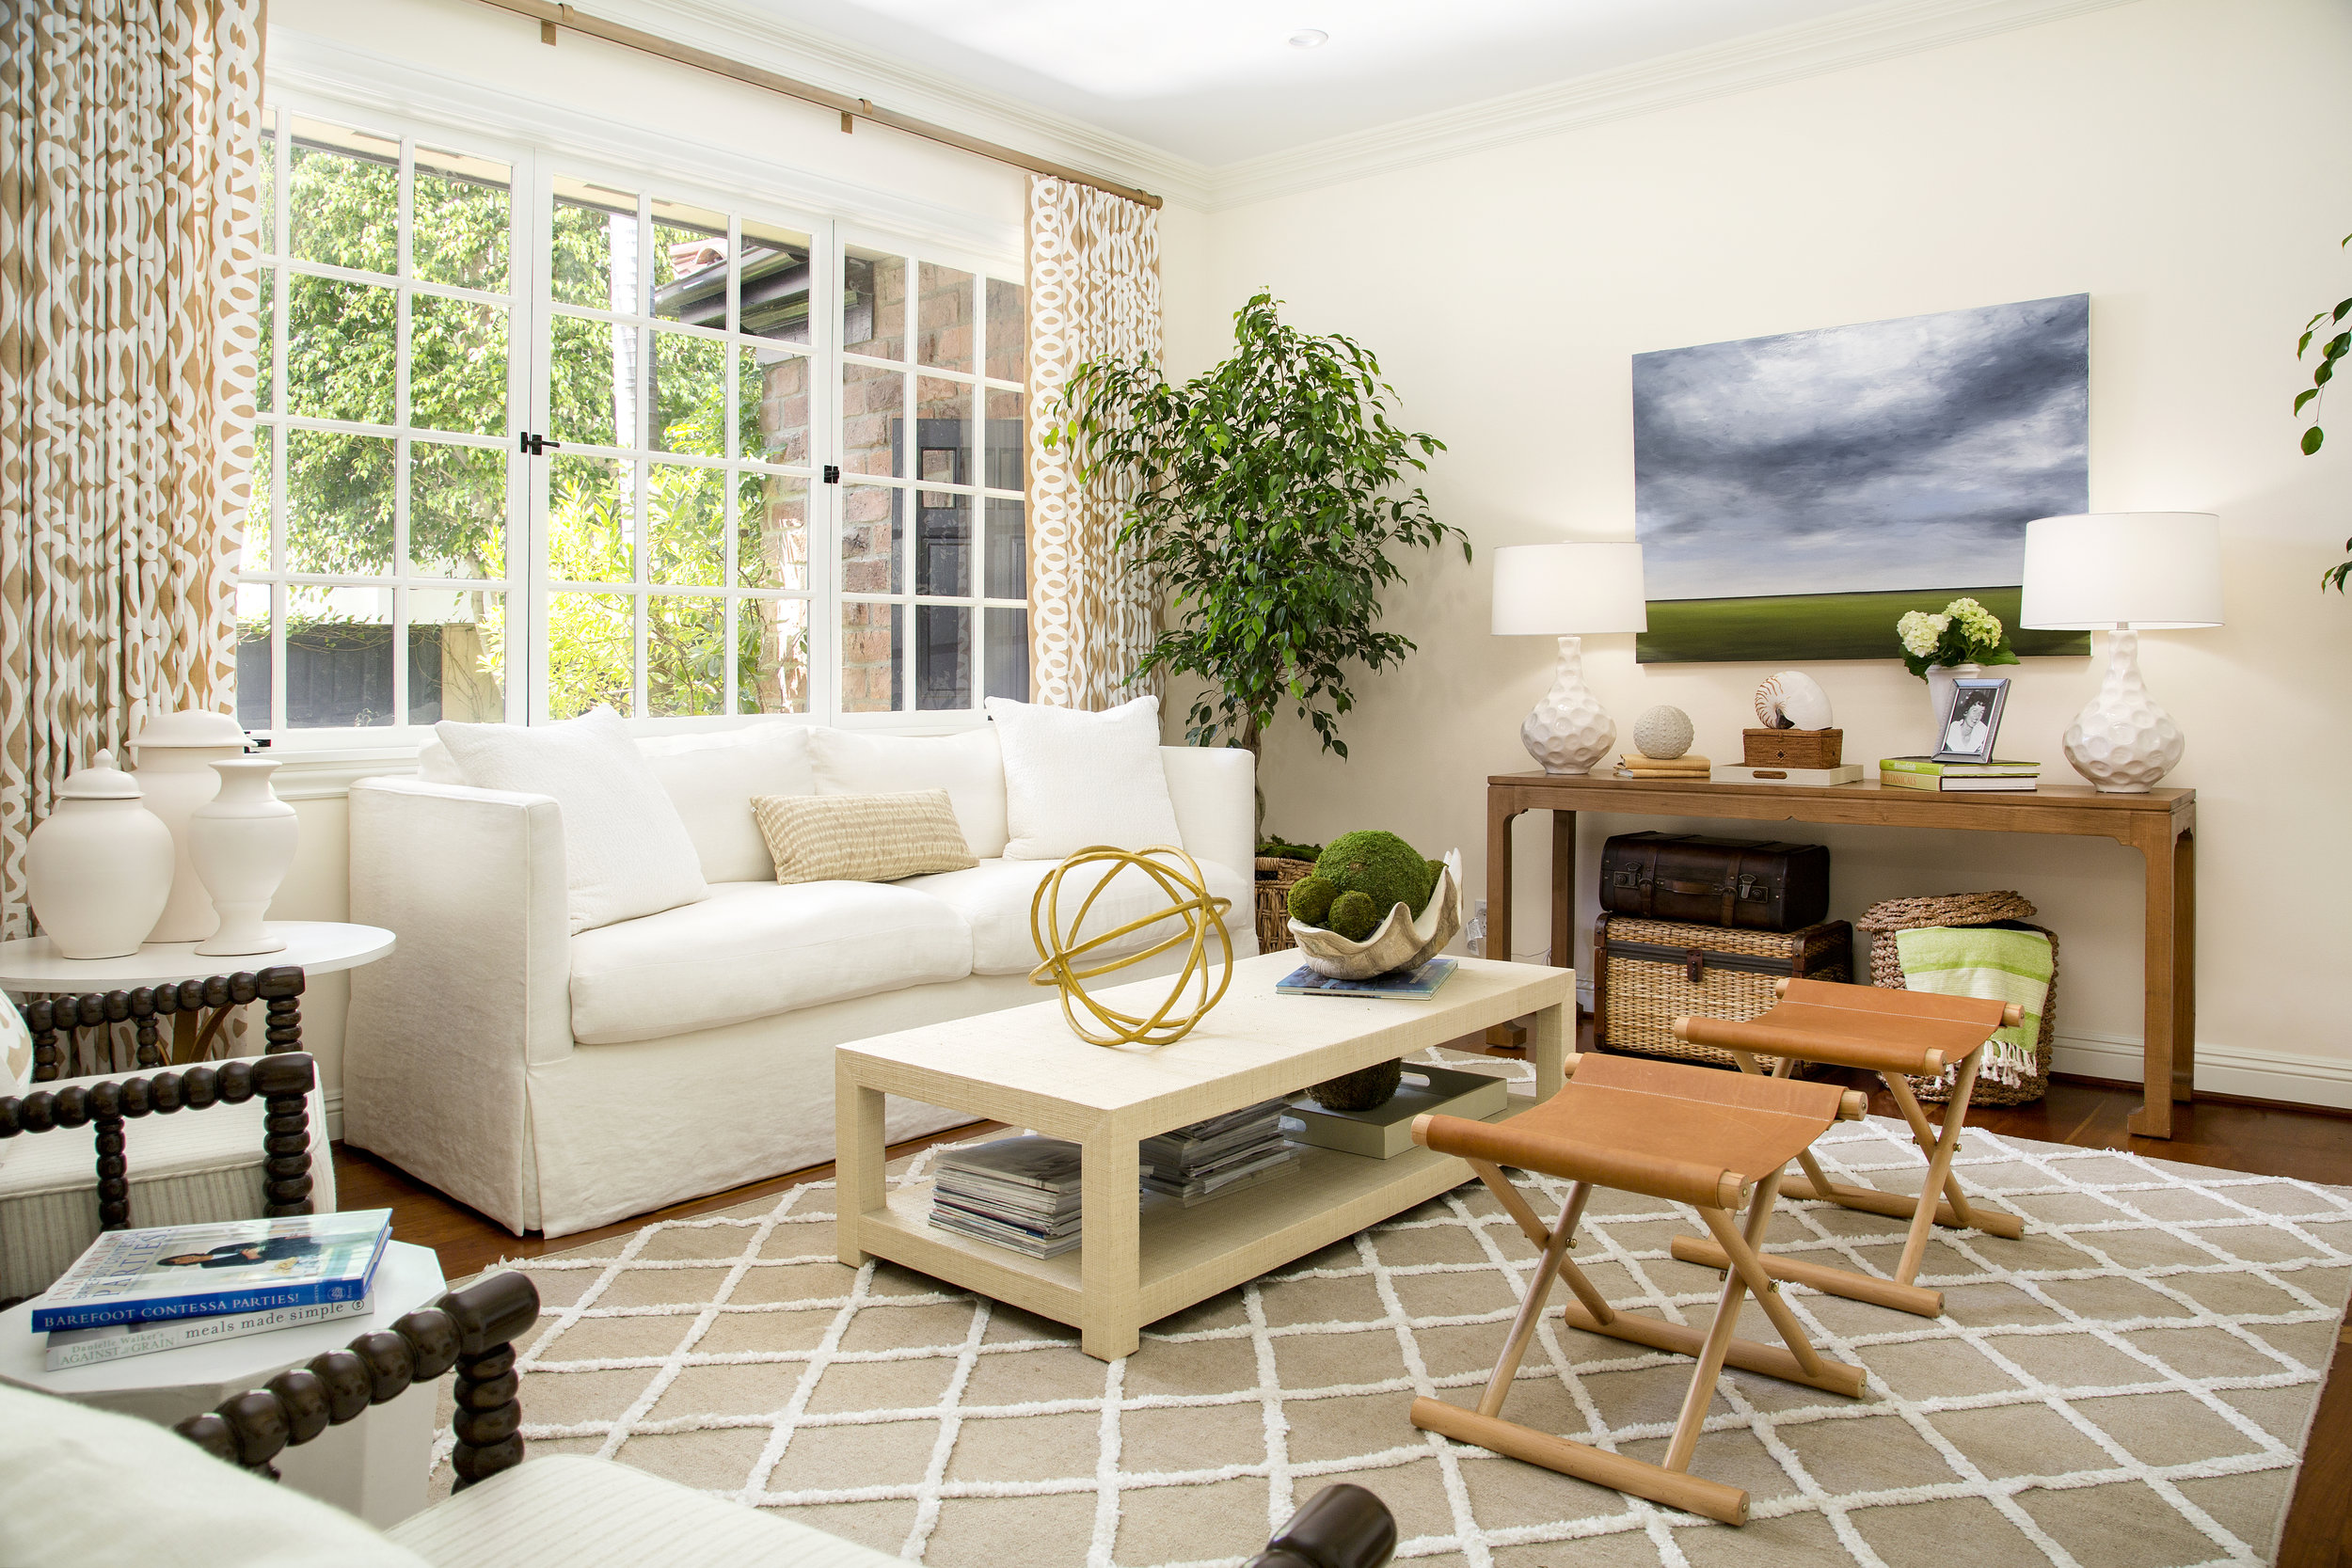 LAUREL living room drapes view.jpg